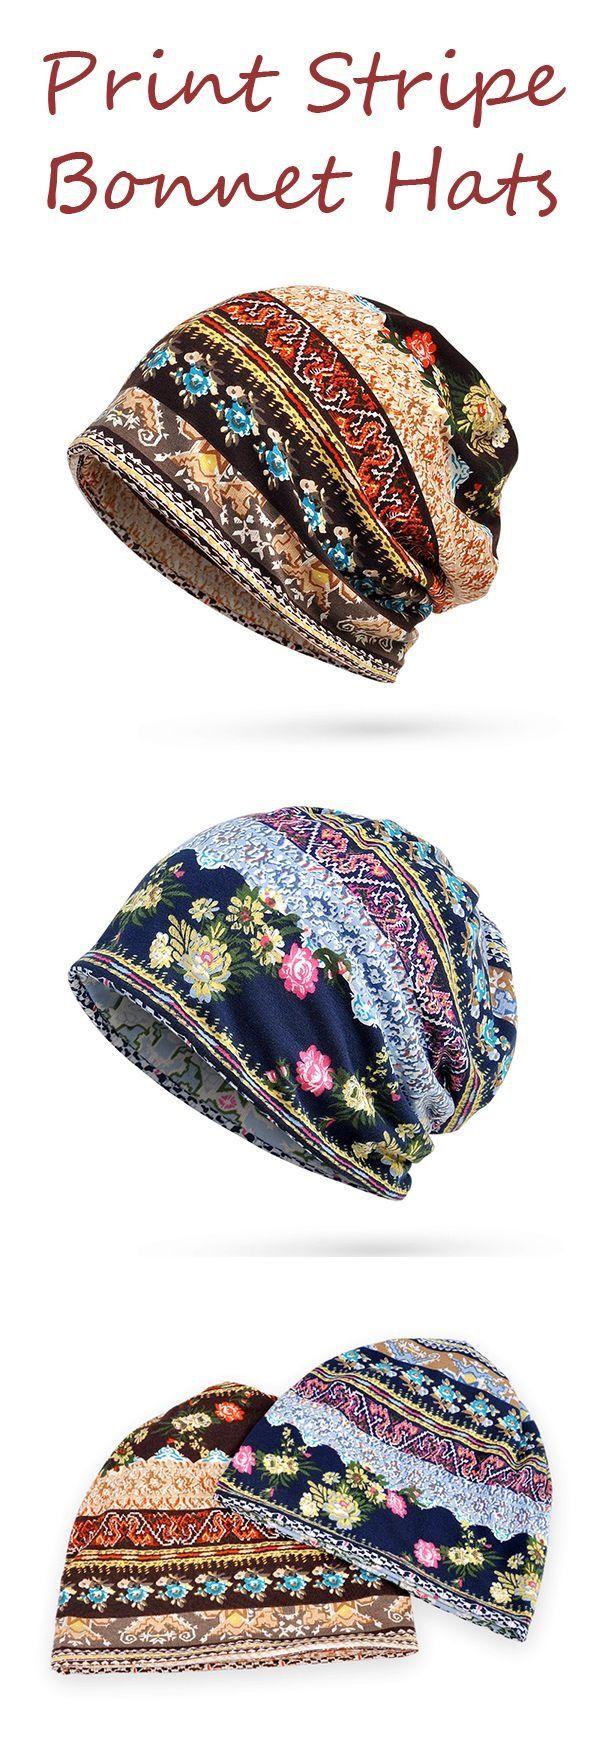 Pin de Rebekah Birkheimer en My Style | Pinterest | Sombreros de ...